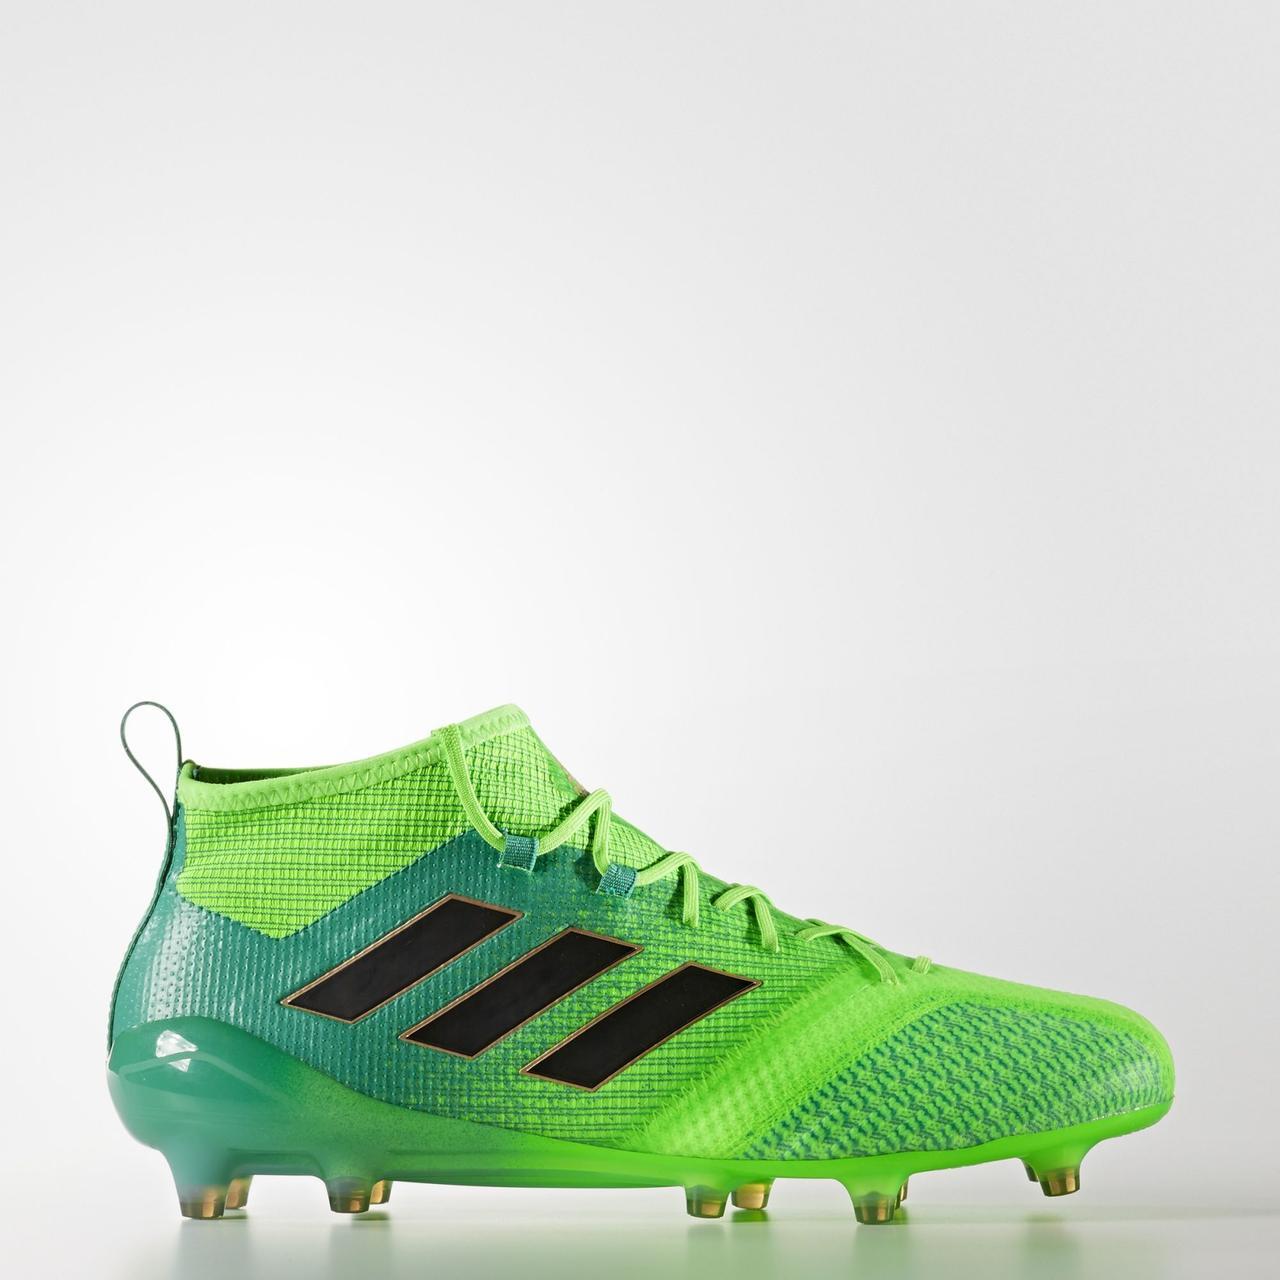 Футбольные бутсы Adidas Performance Ace 17.1 Primeknit FG (Артикул  BB5961) 8262ad4d530